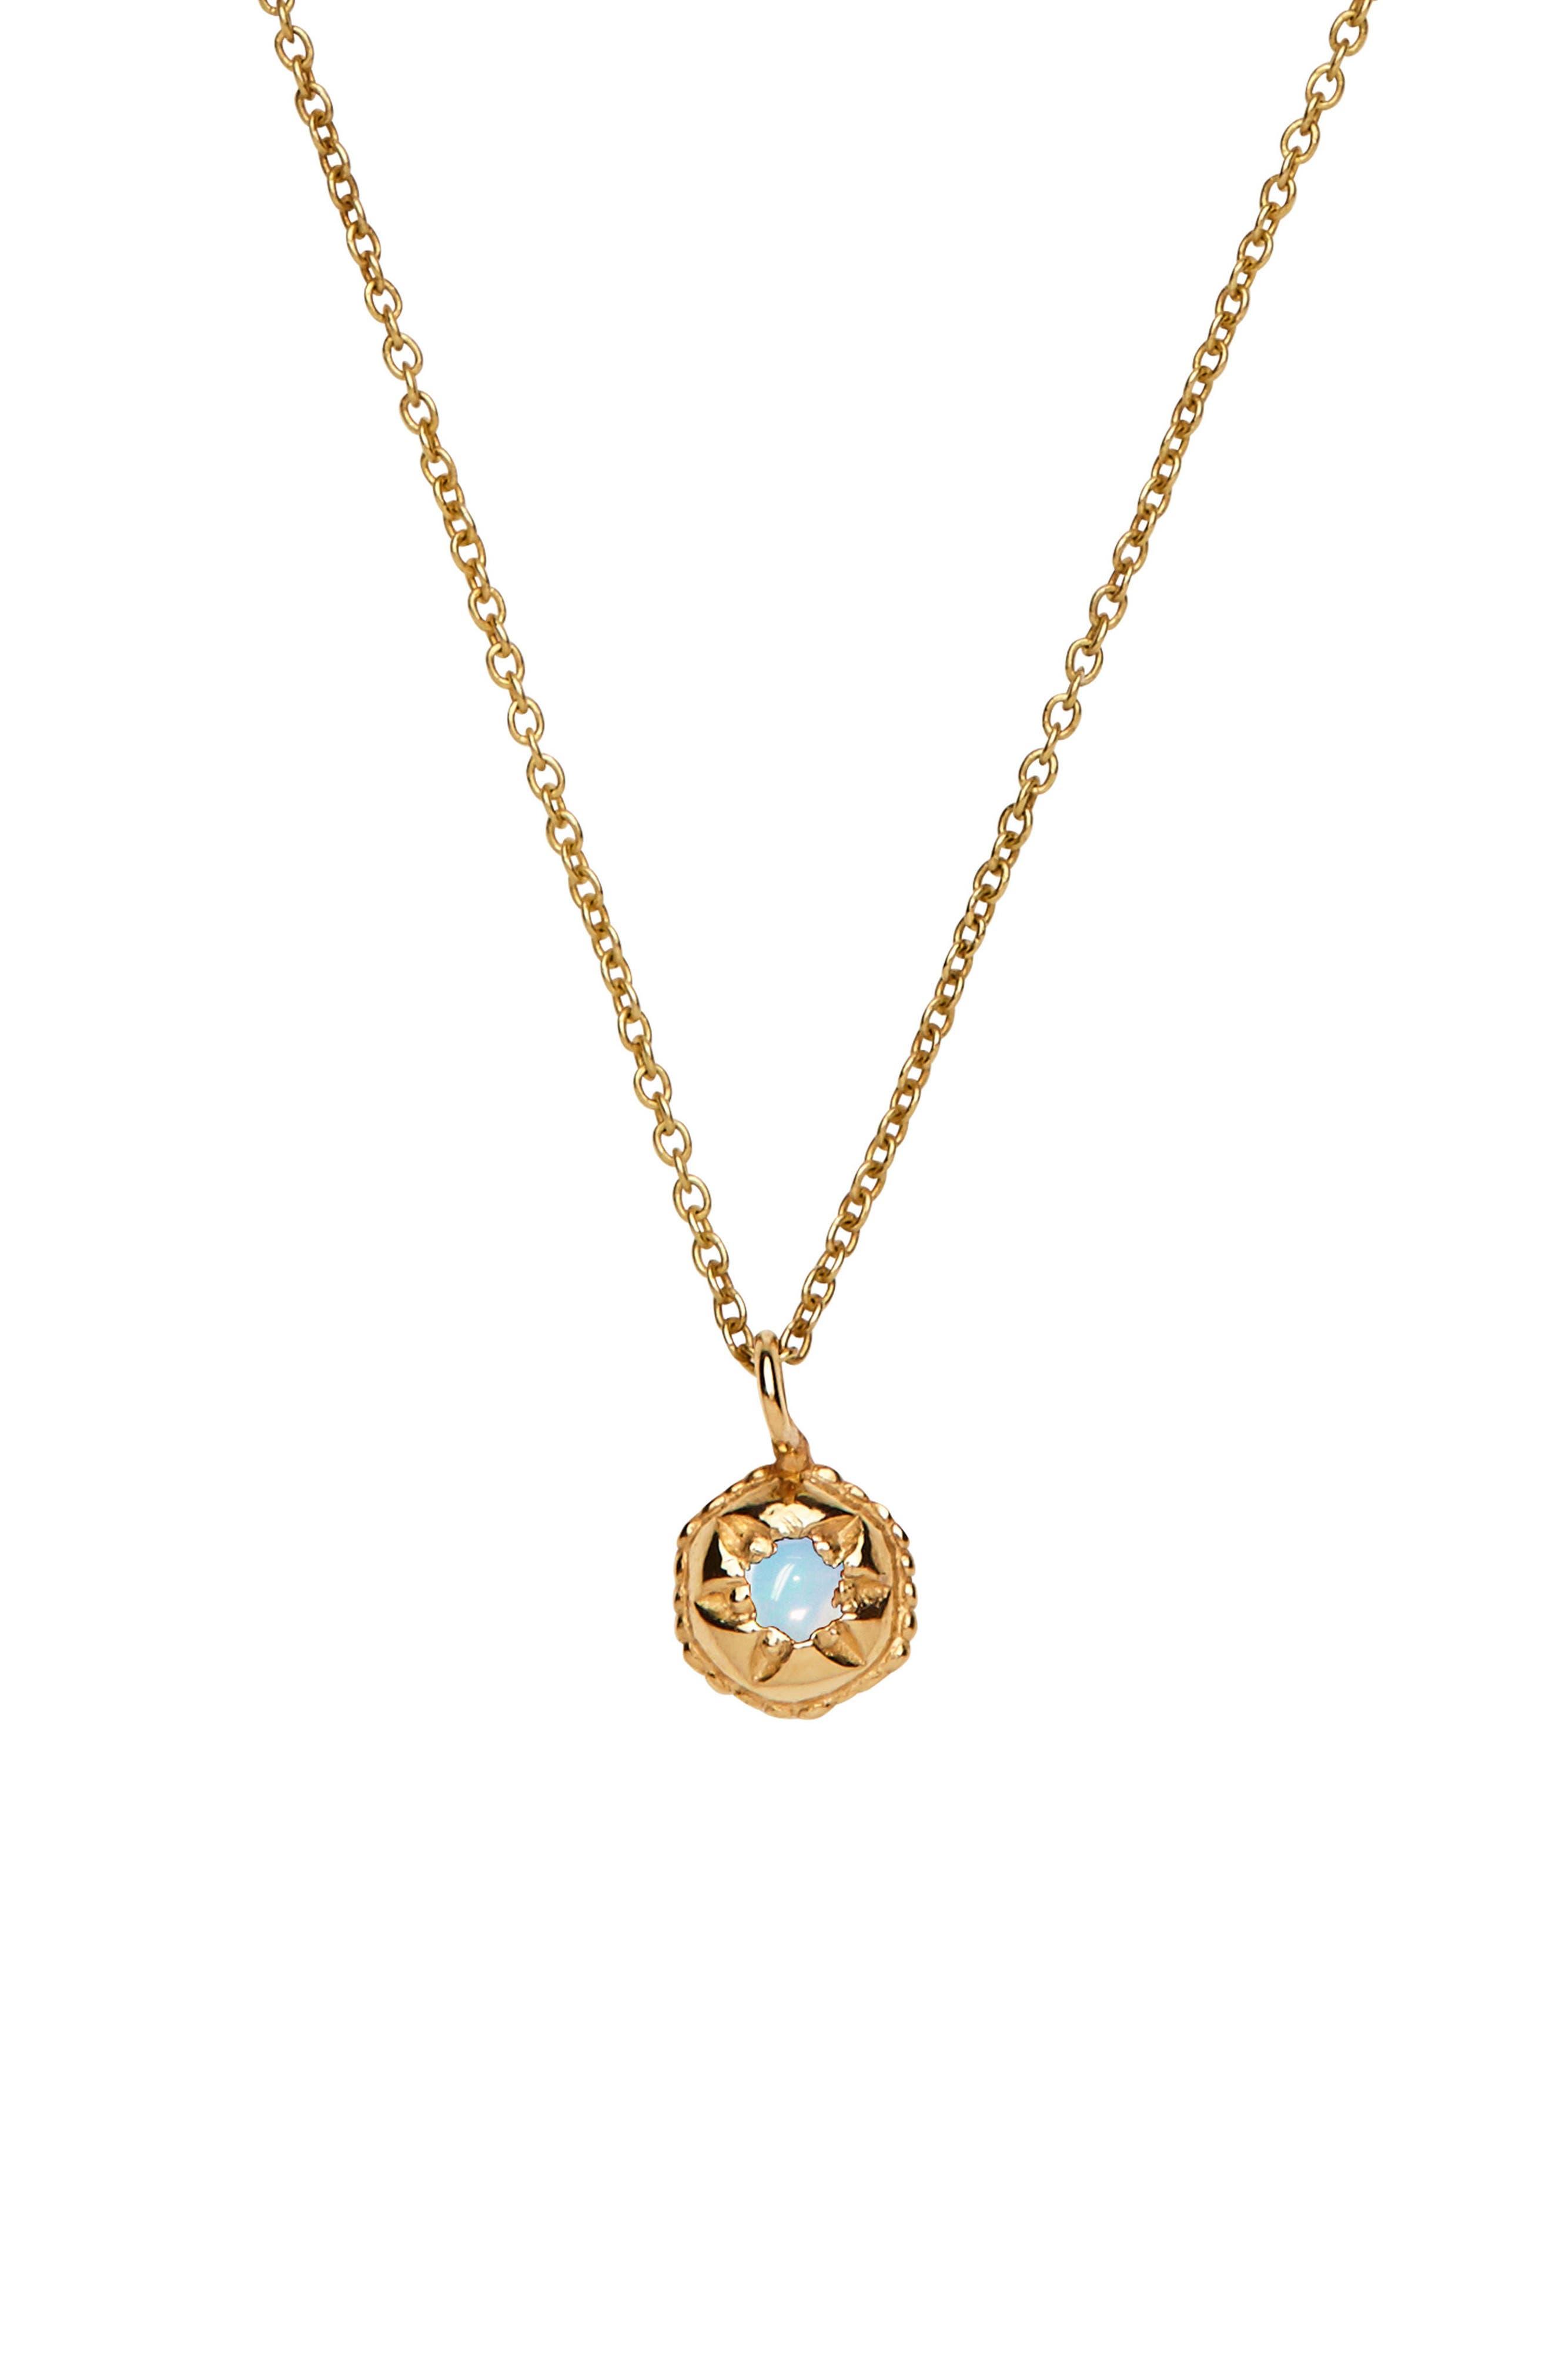 Mystic Opal Pendant Necklace,                         Main,                         color, YELLOW GOLD/ OPAL